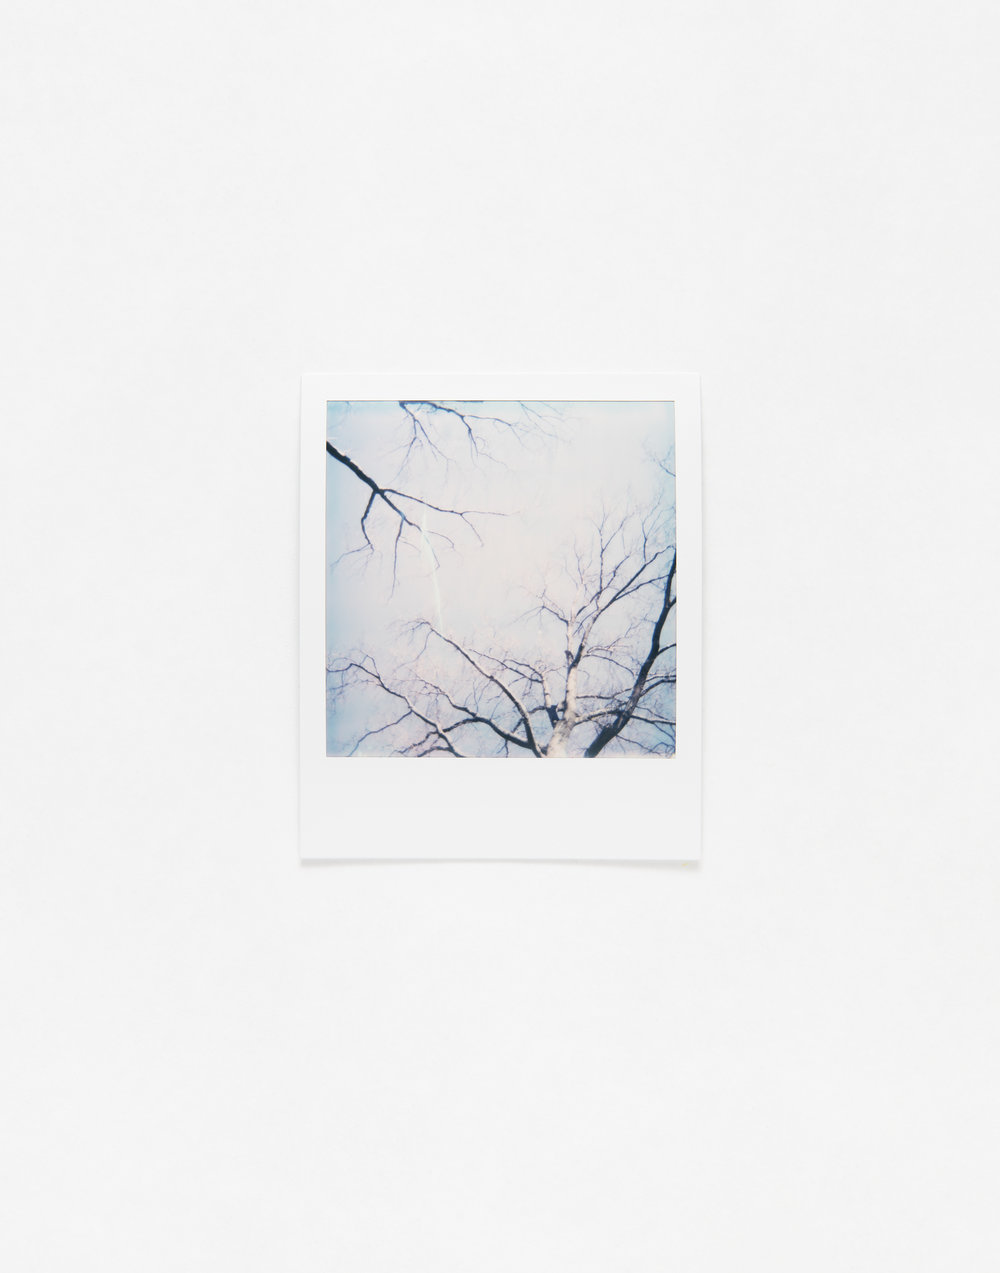 180331_Polaroid_0015.jpg